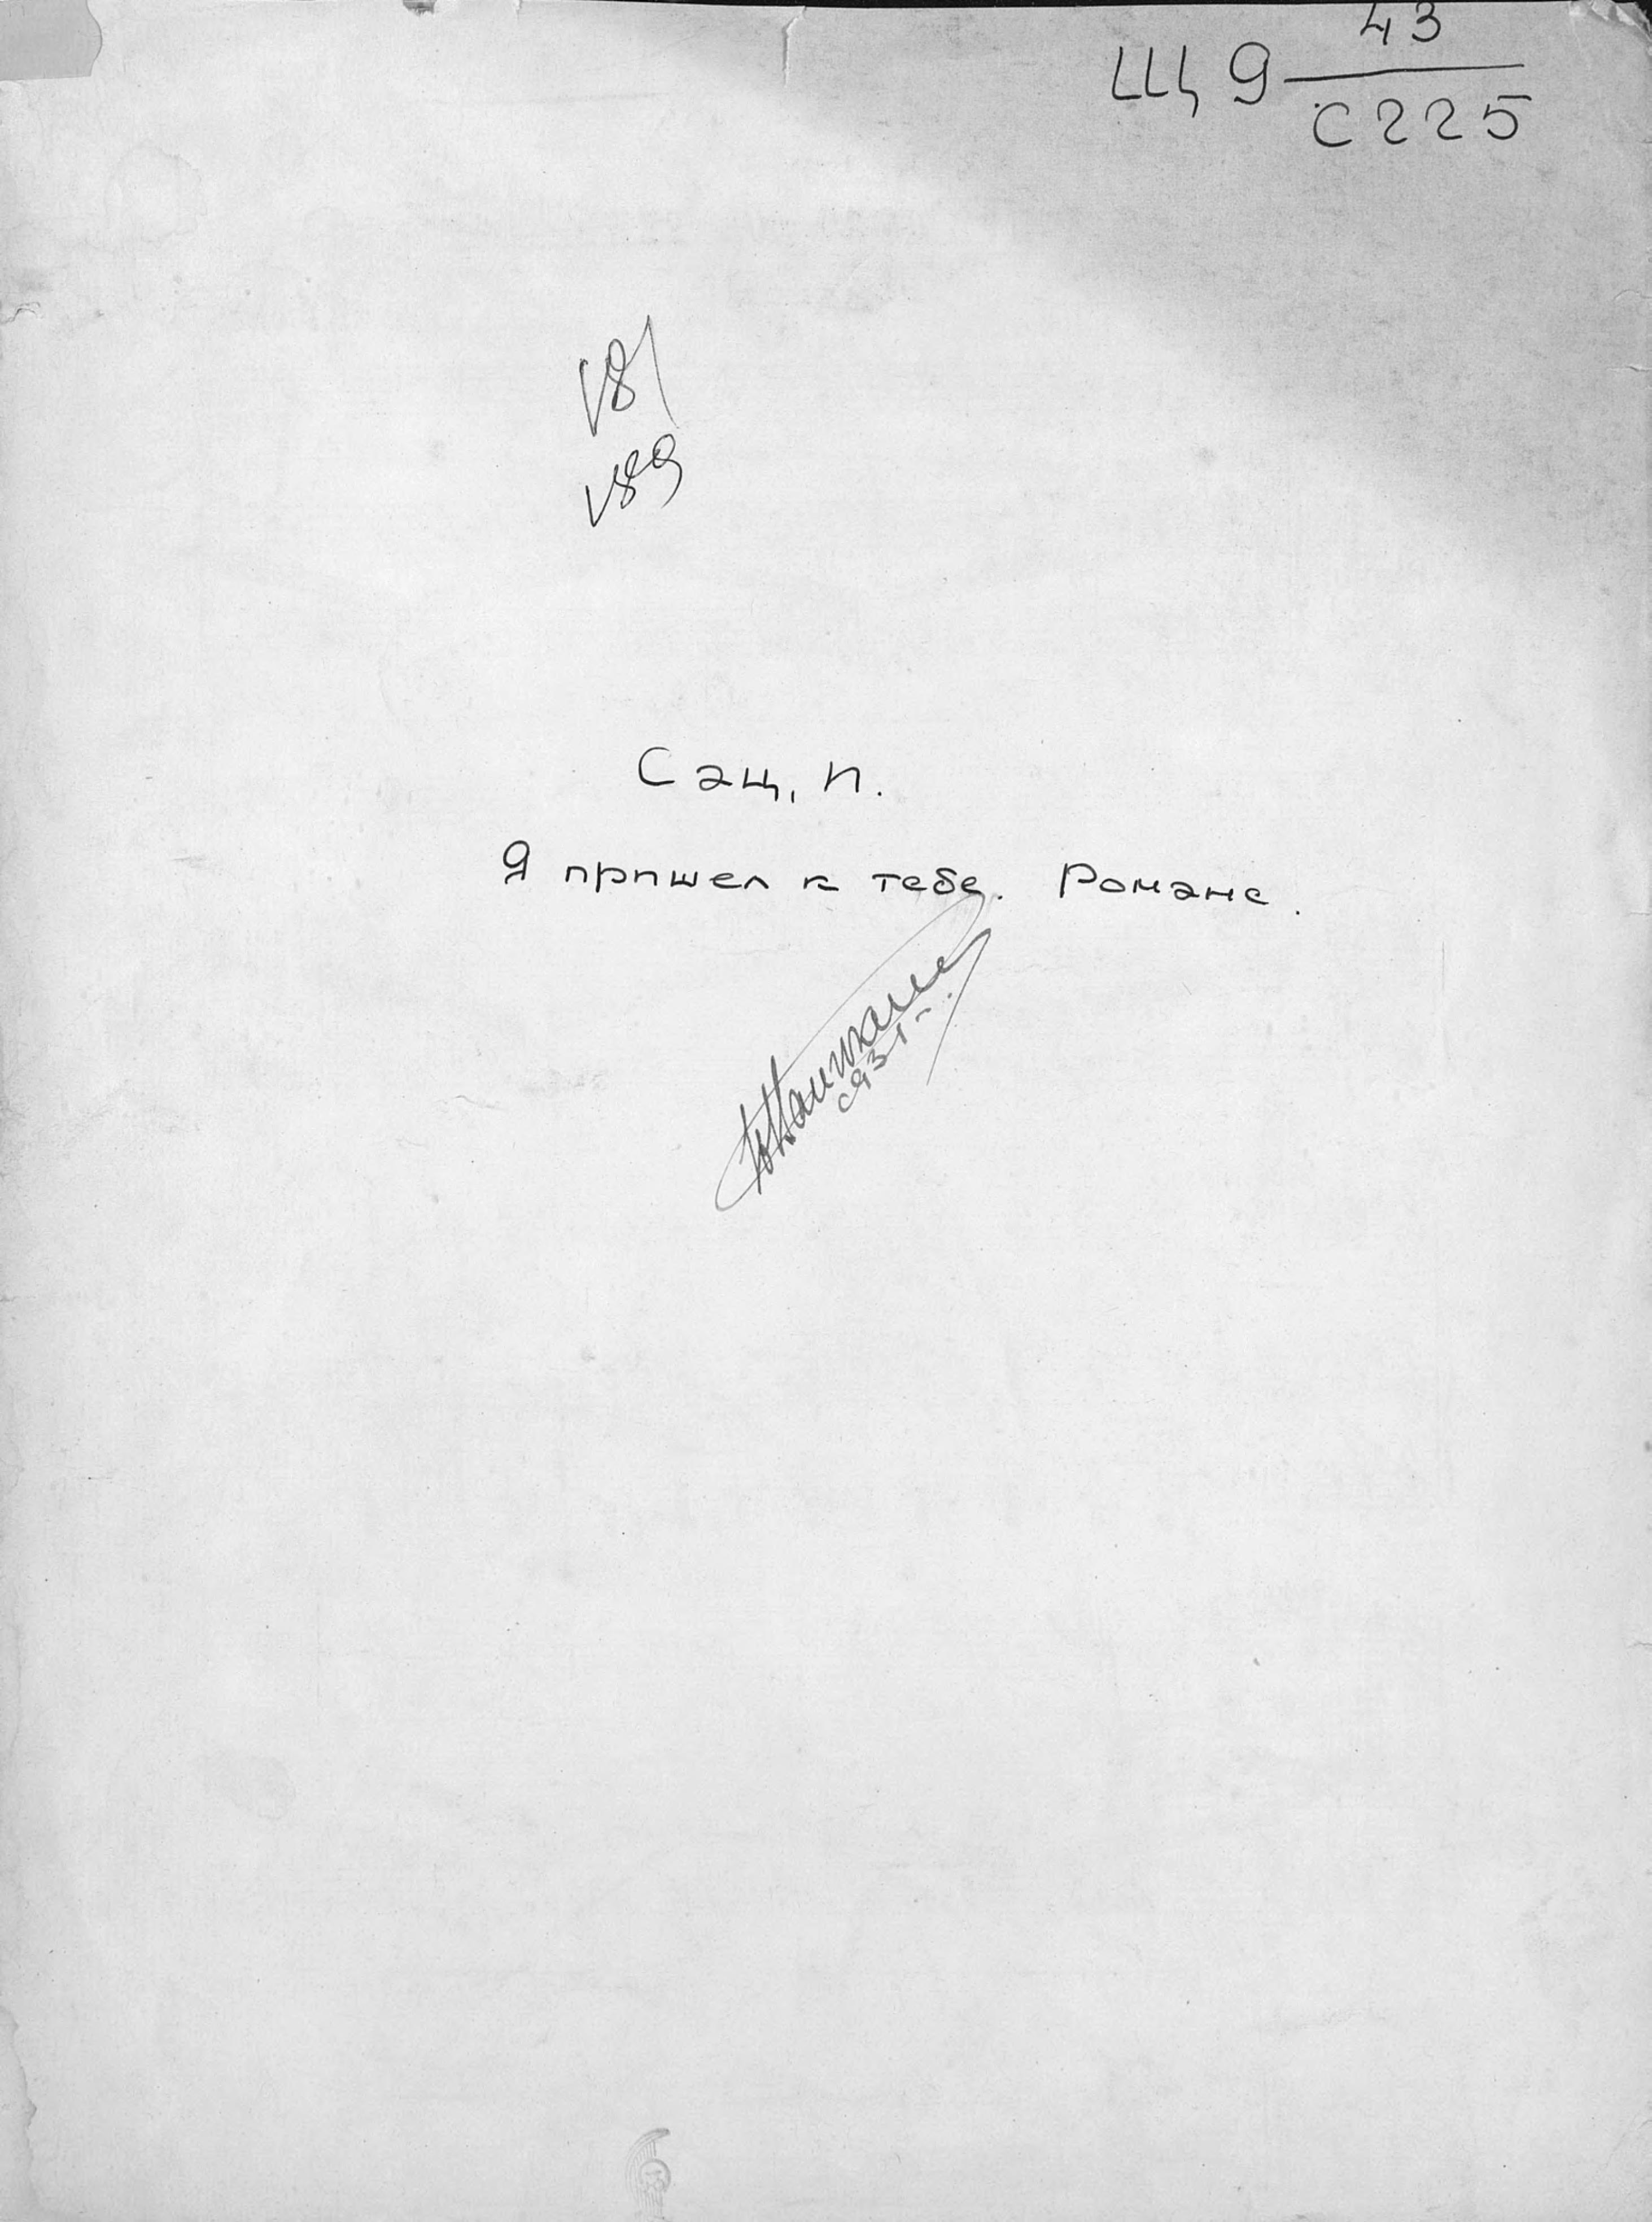 Сац Илья Александрович Я пришел к тебе евтушенко евгений александрович я пришел в ххi век isbn 978 5 699 71205 2